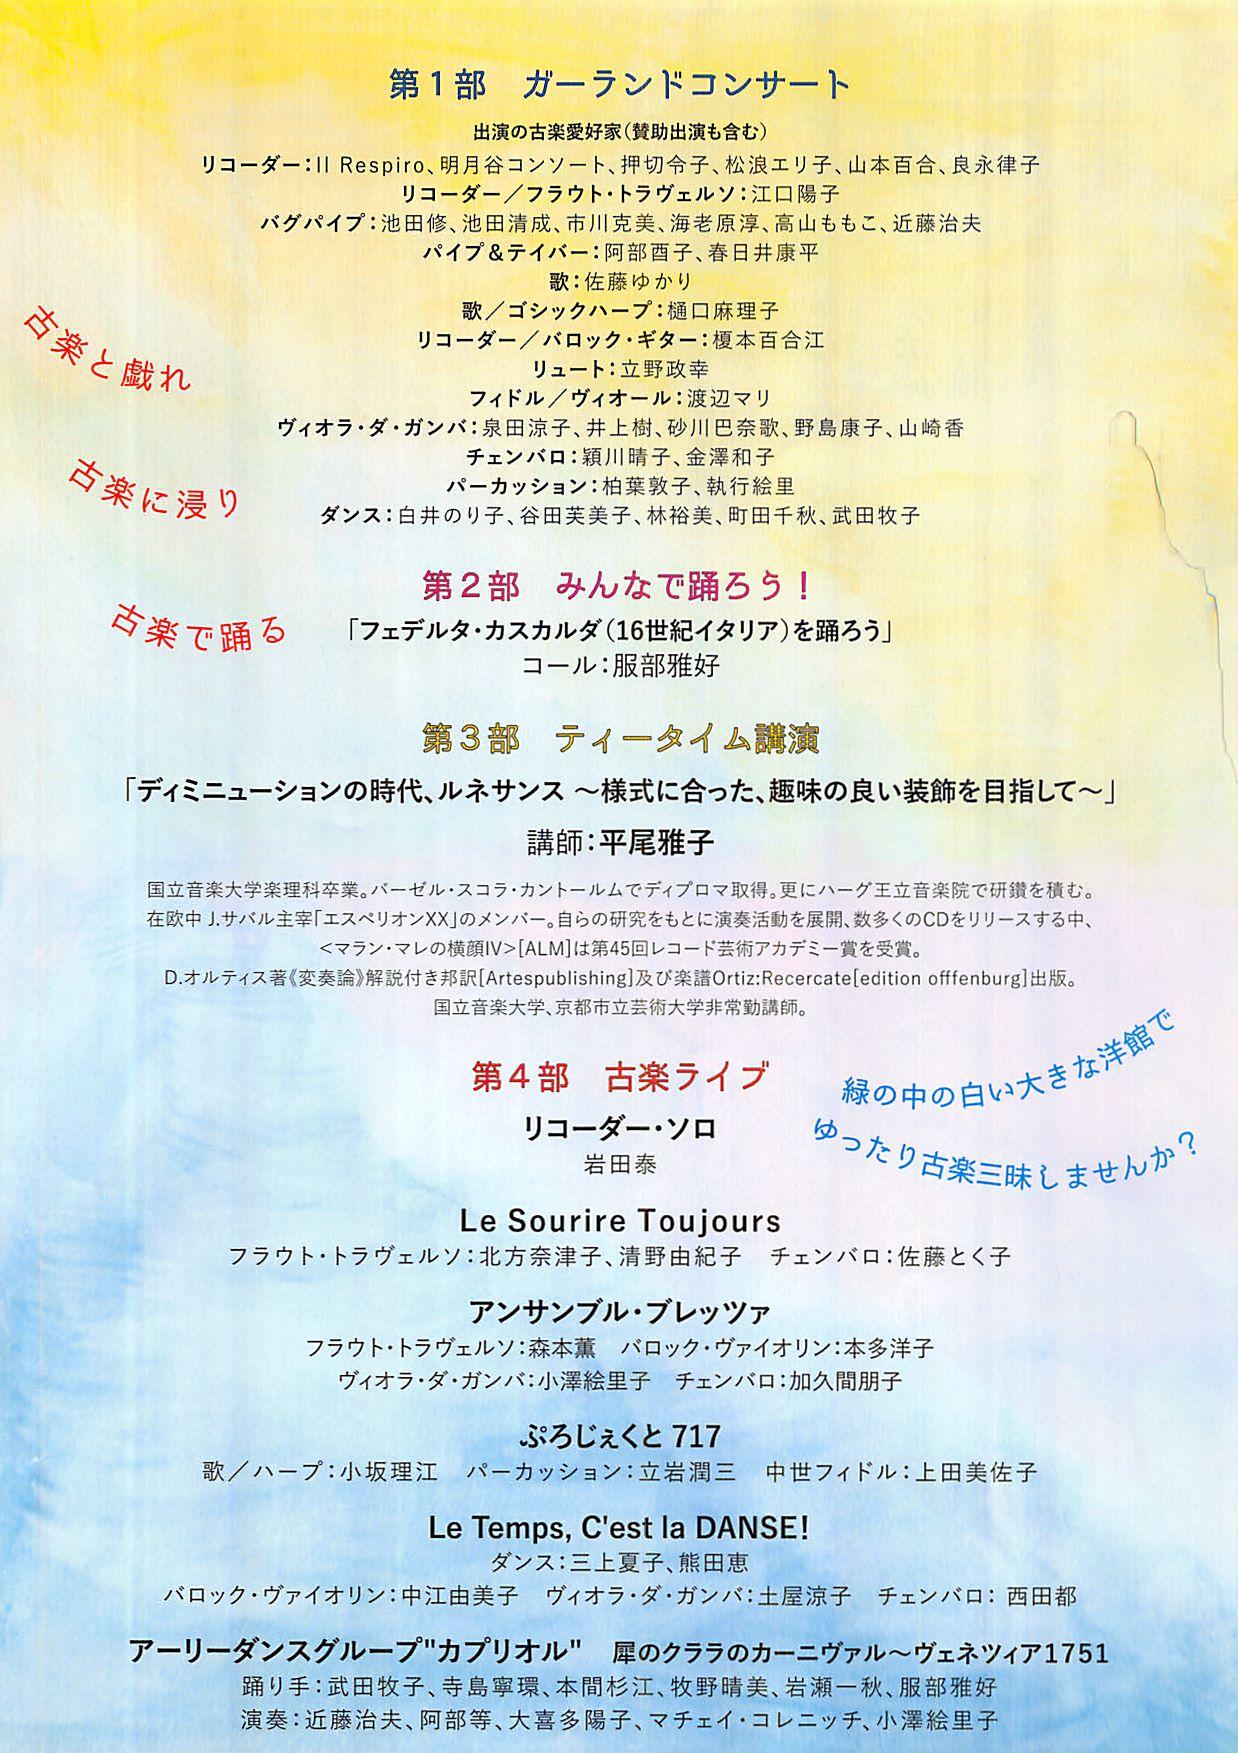 2016-07-06-11-52-53_002